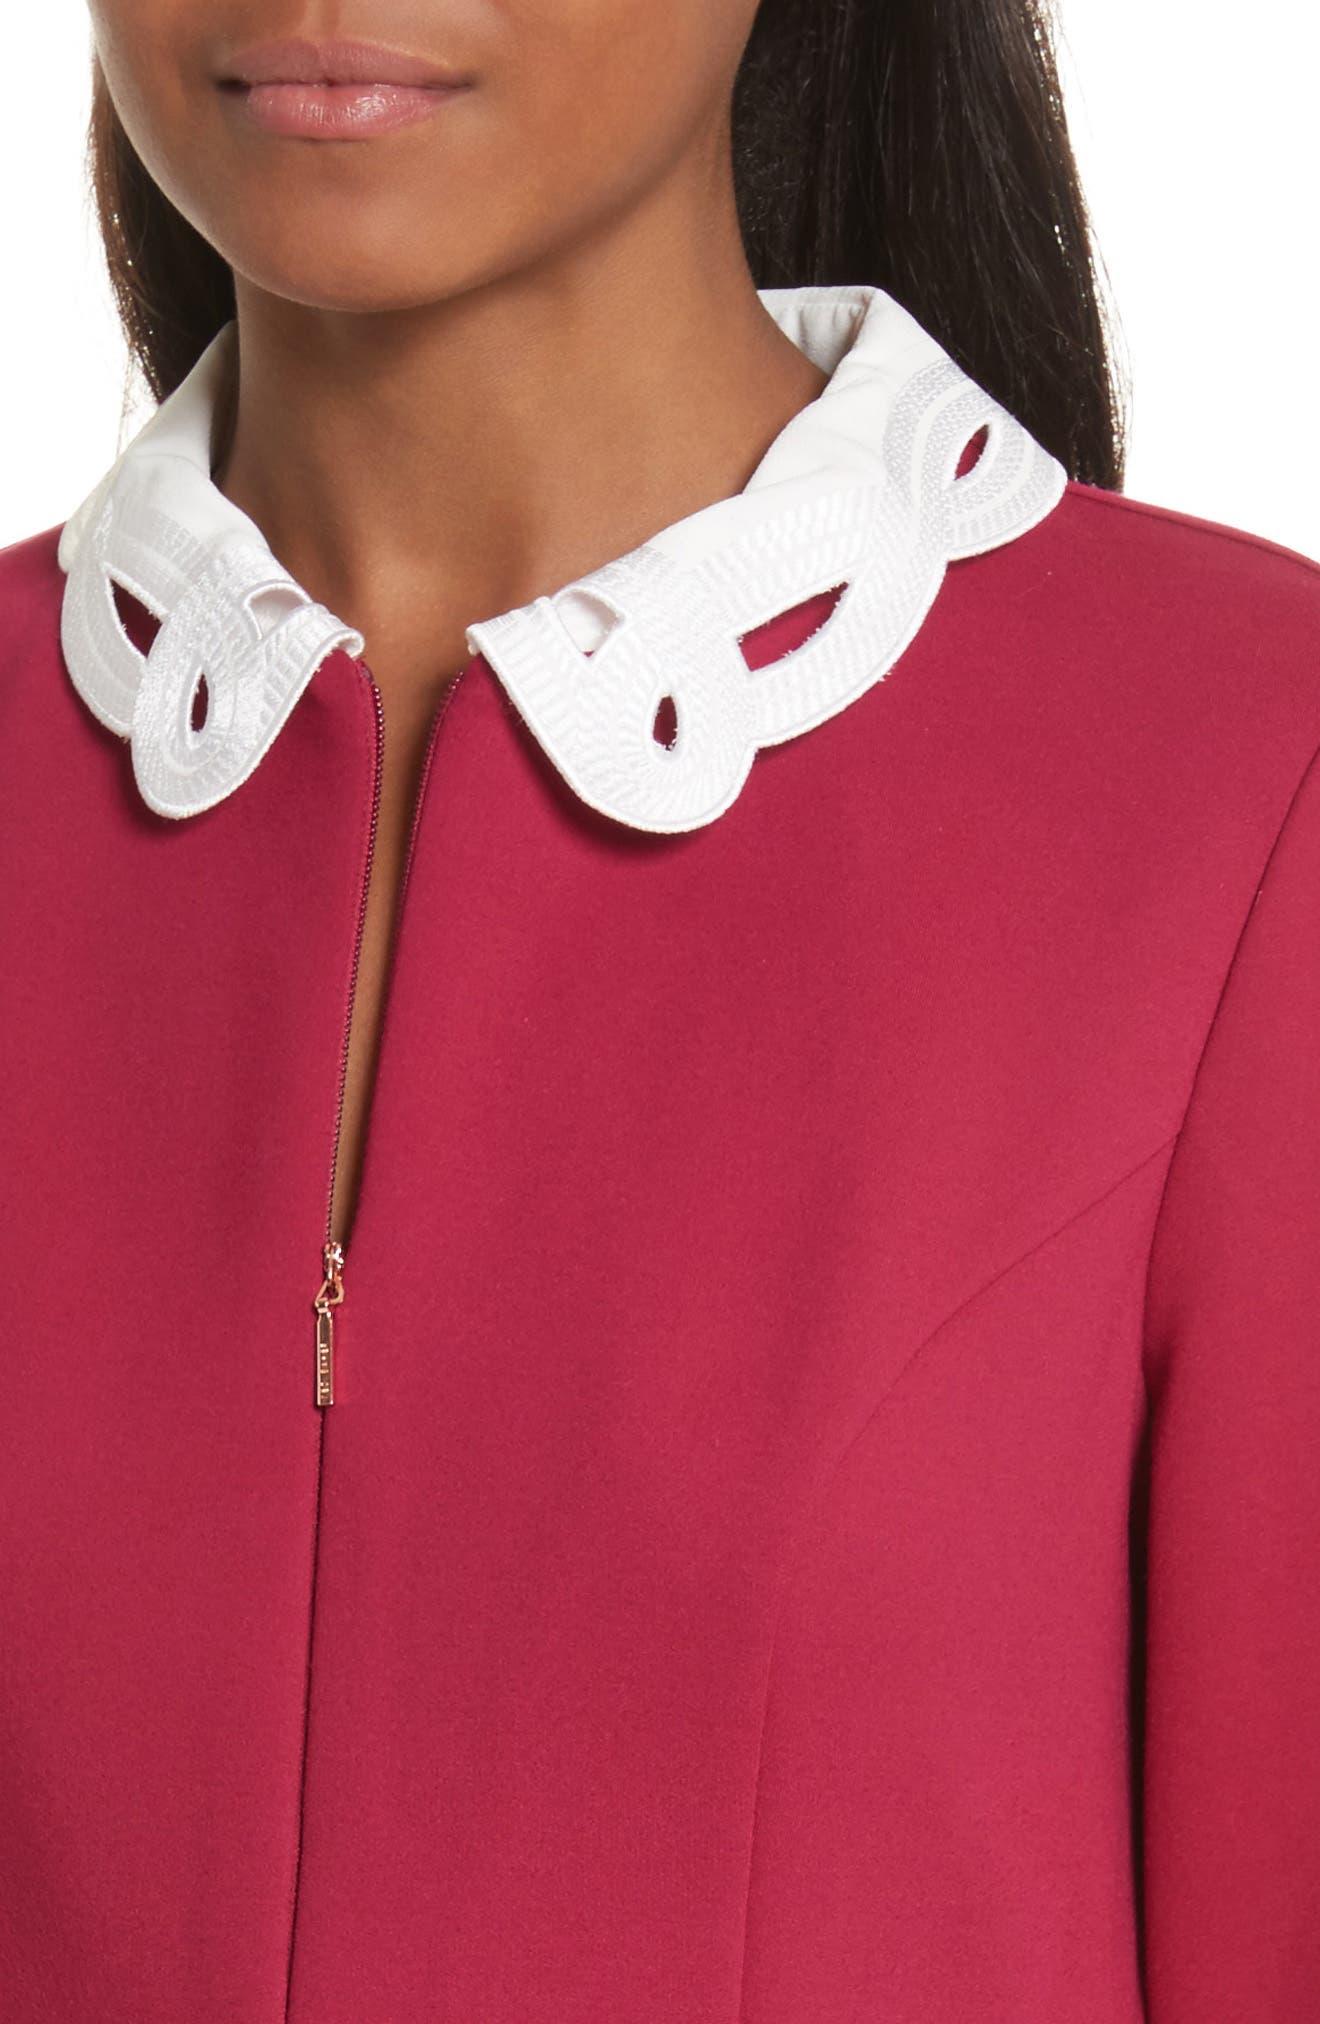 Shealah Embroidered Trim A-Line Dress,                             Alternate thumbnail 4, color,                             651